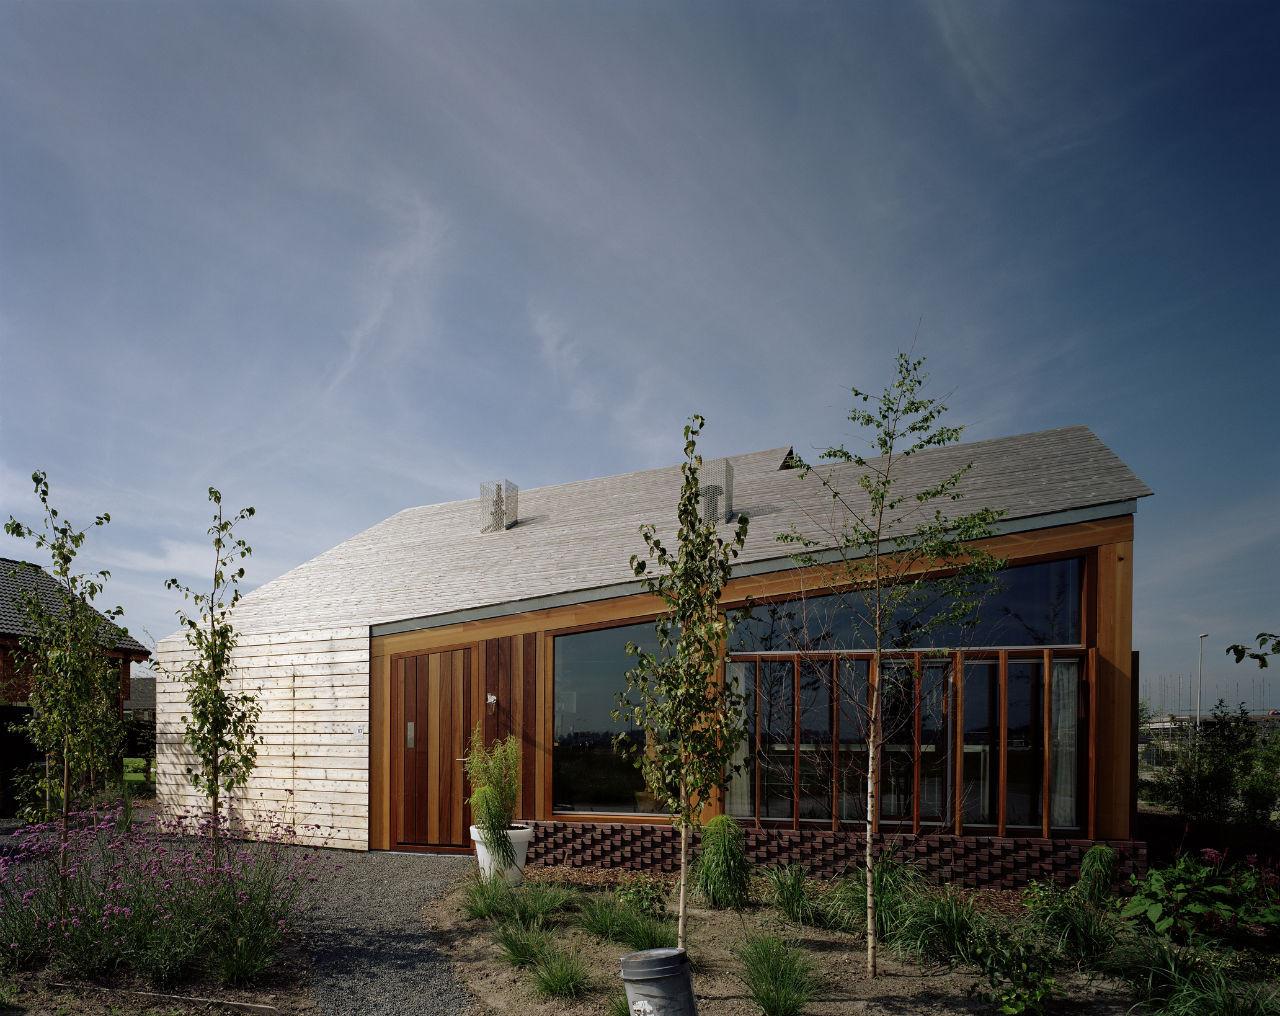 Dogma House Leeuwarden / Onix, © Unknown photographer